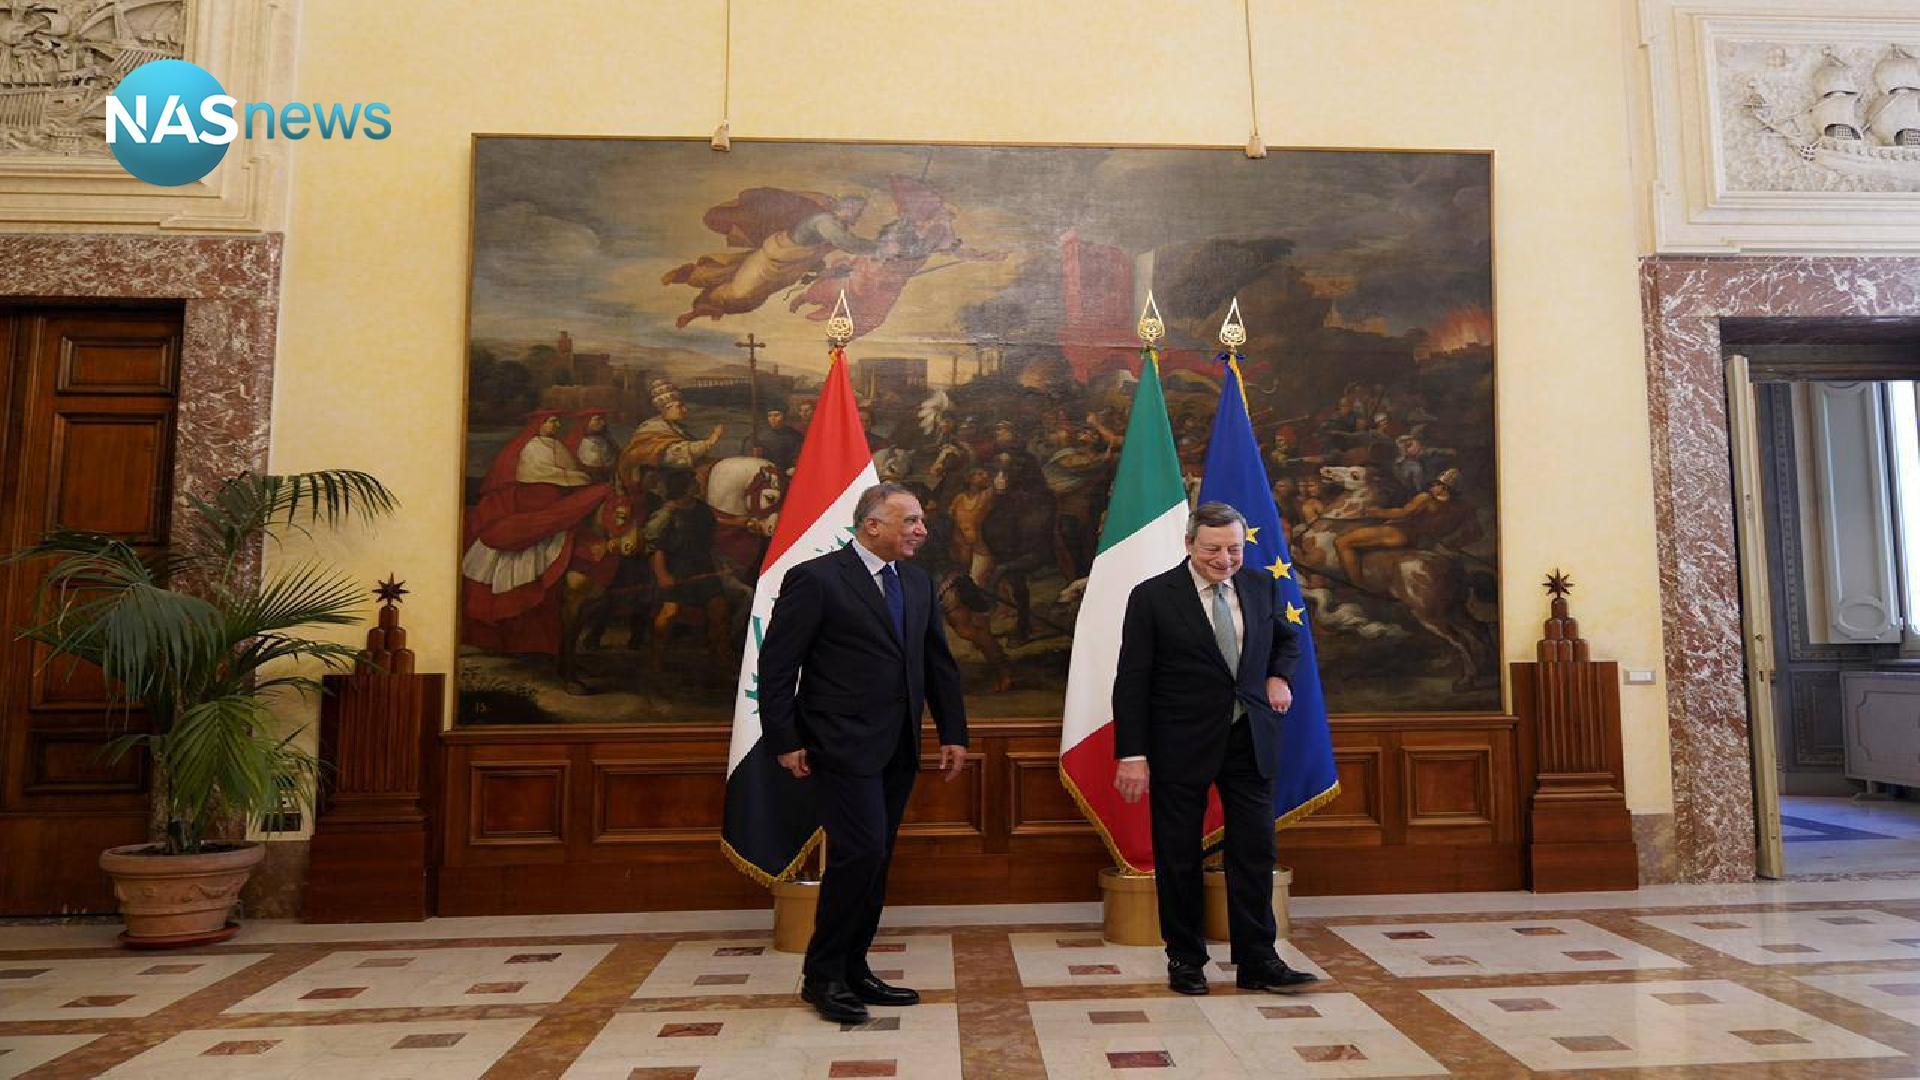 Al-Kazemi meets the Italian Prime Minister in Rome